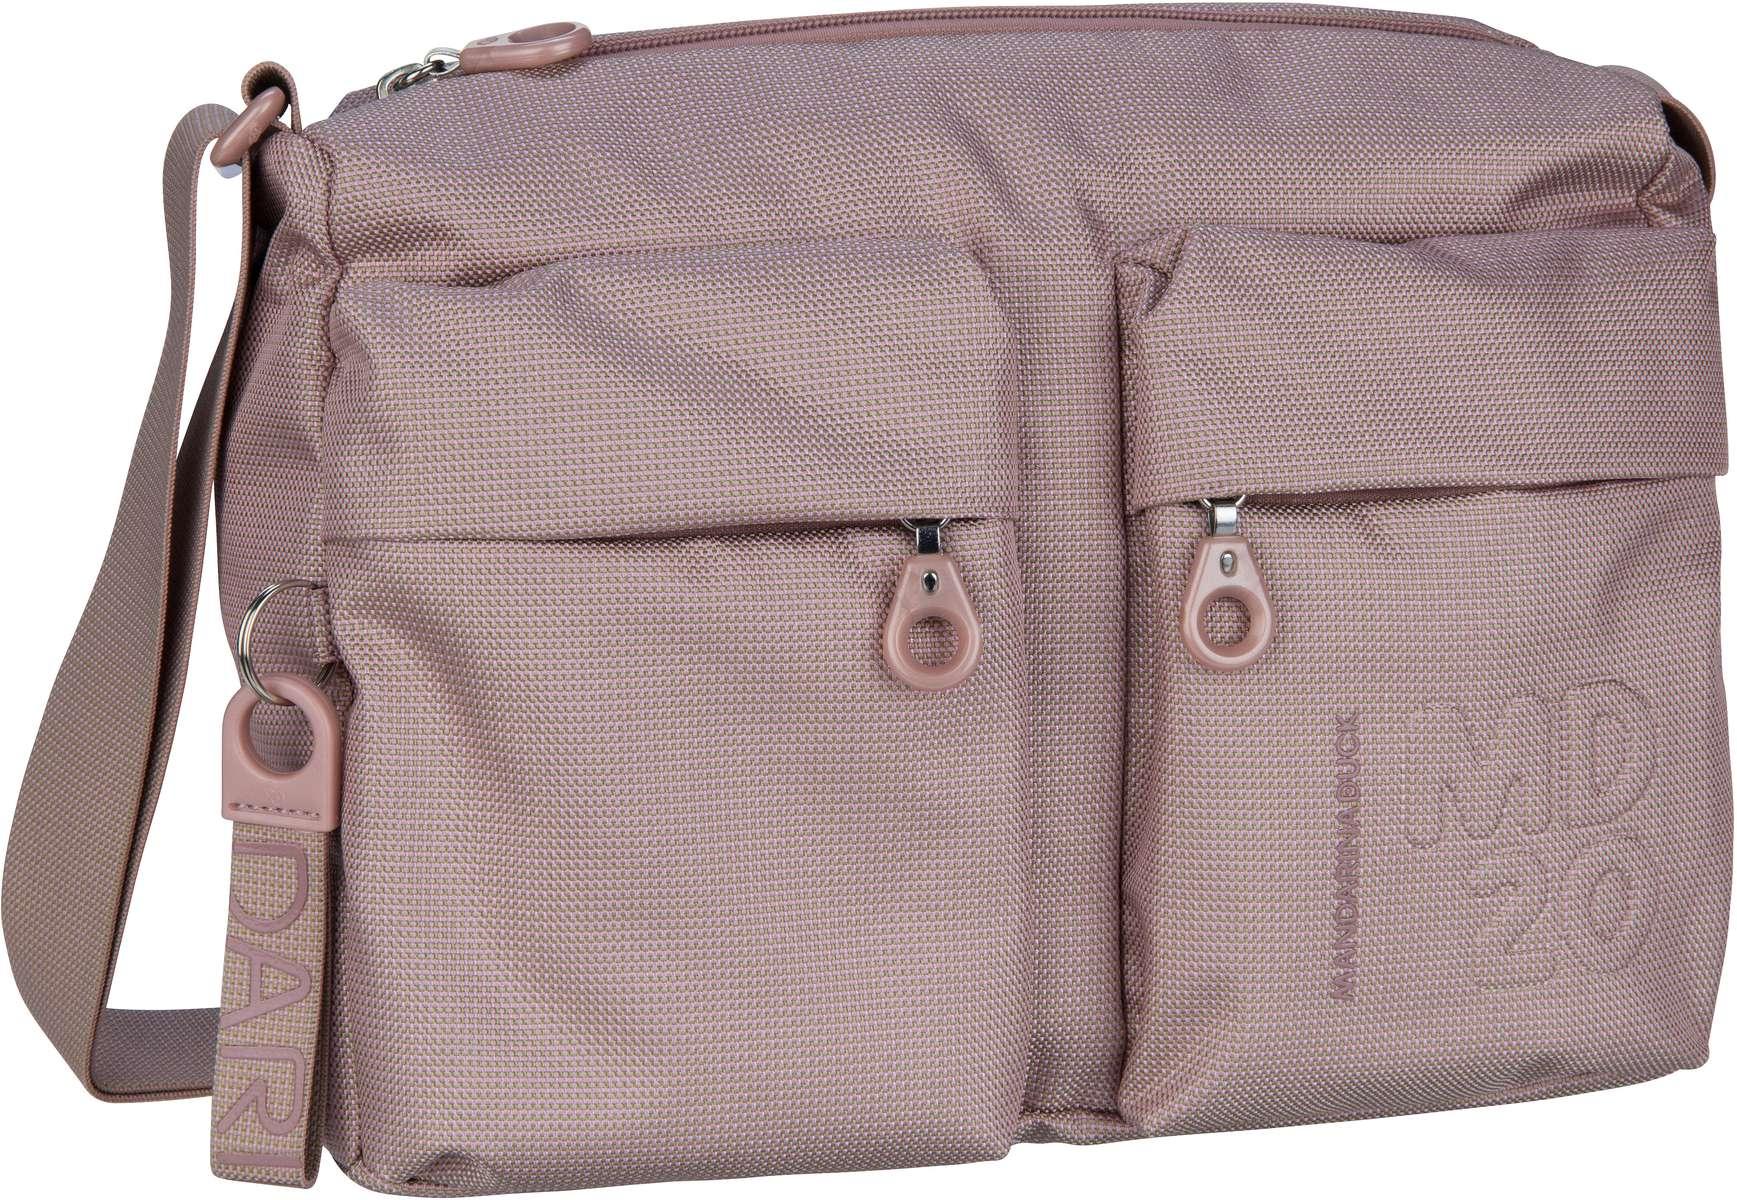 Umhängetasche MD20 Crossover Bag QMTT5 Pale Blush